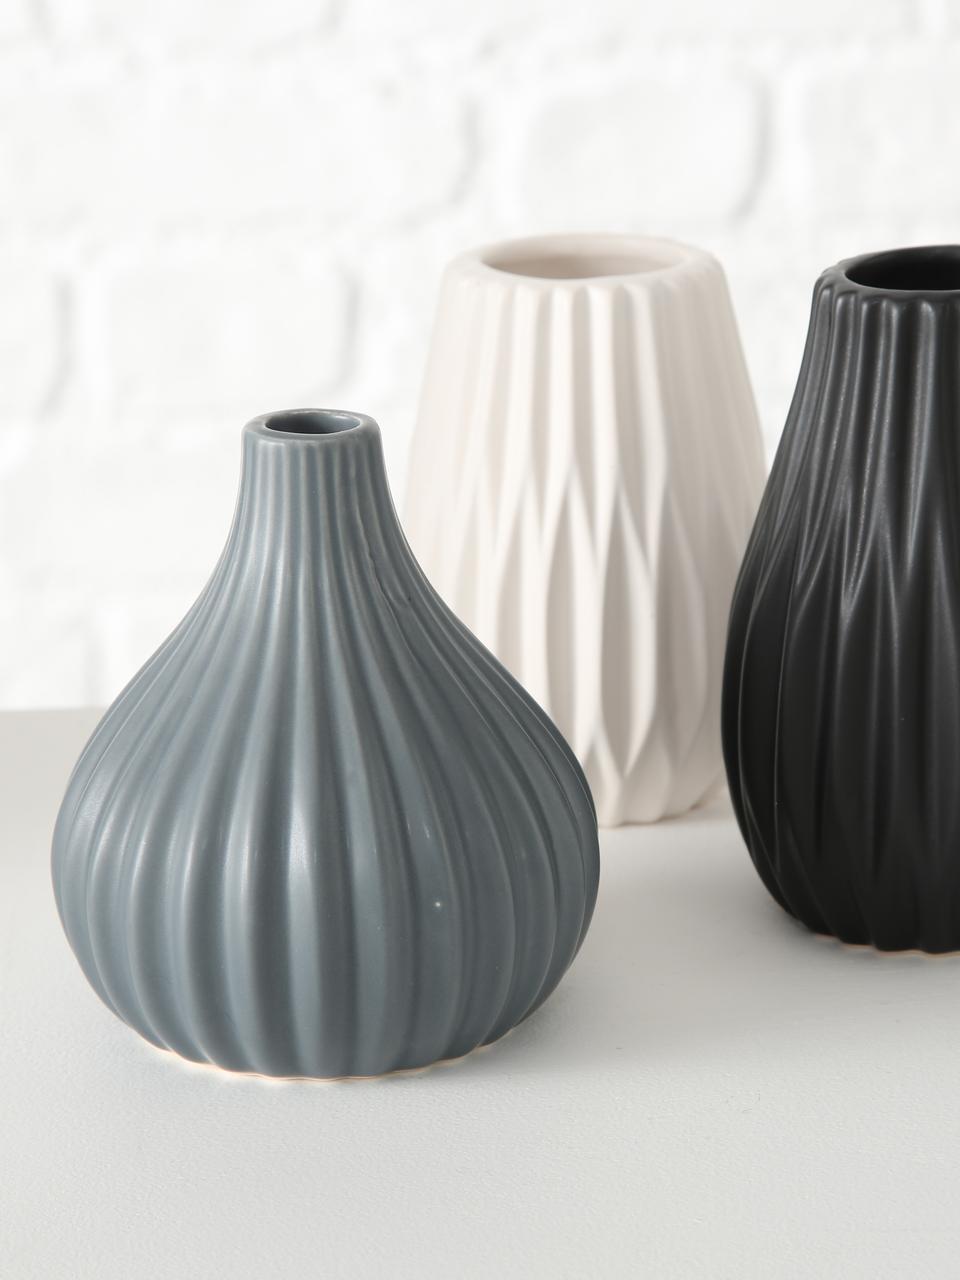 Set 3 vasi in terracotta Wilma, Terracotta, Blu, nero, bianco, Ø 9 x Alt. 11 cm